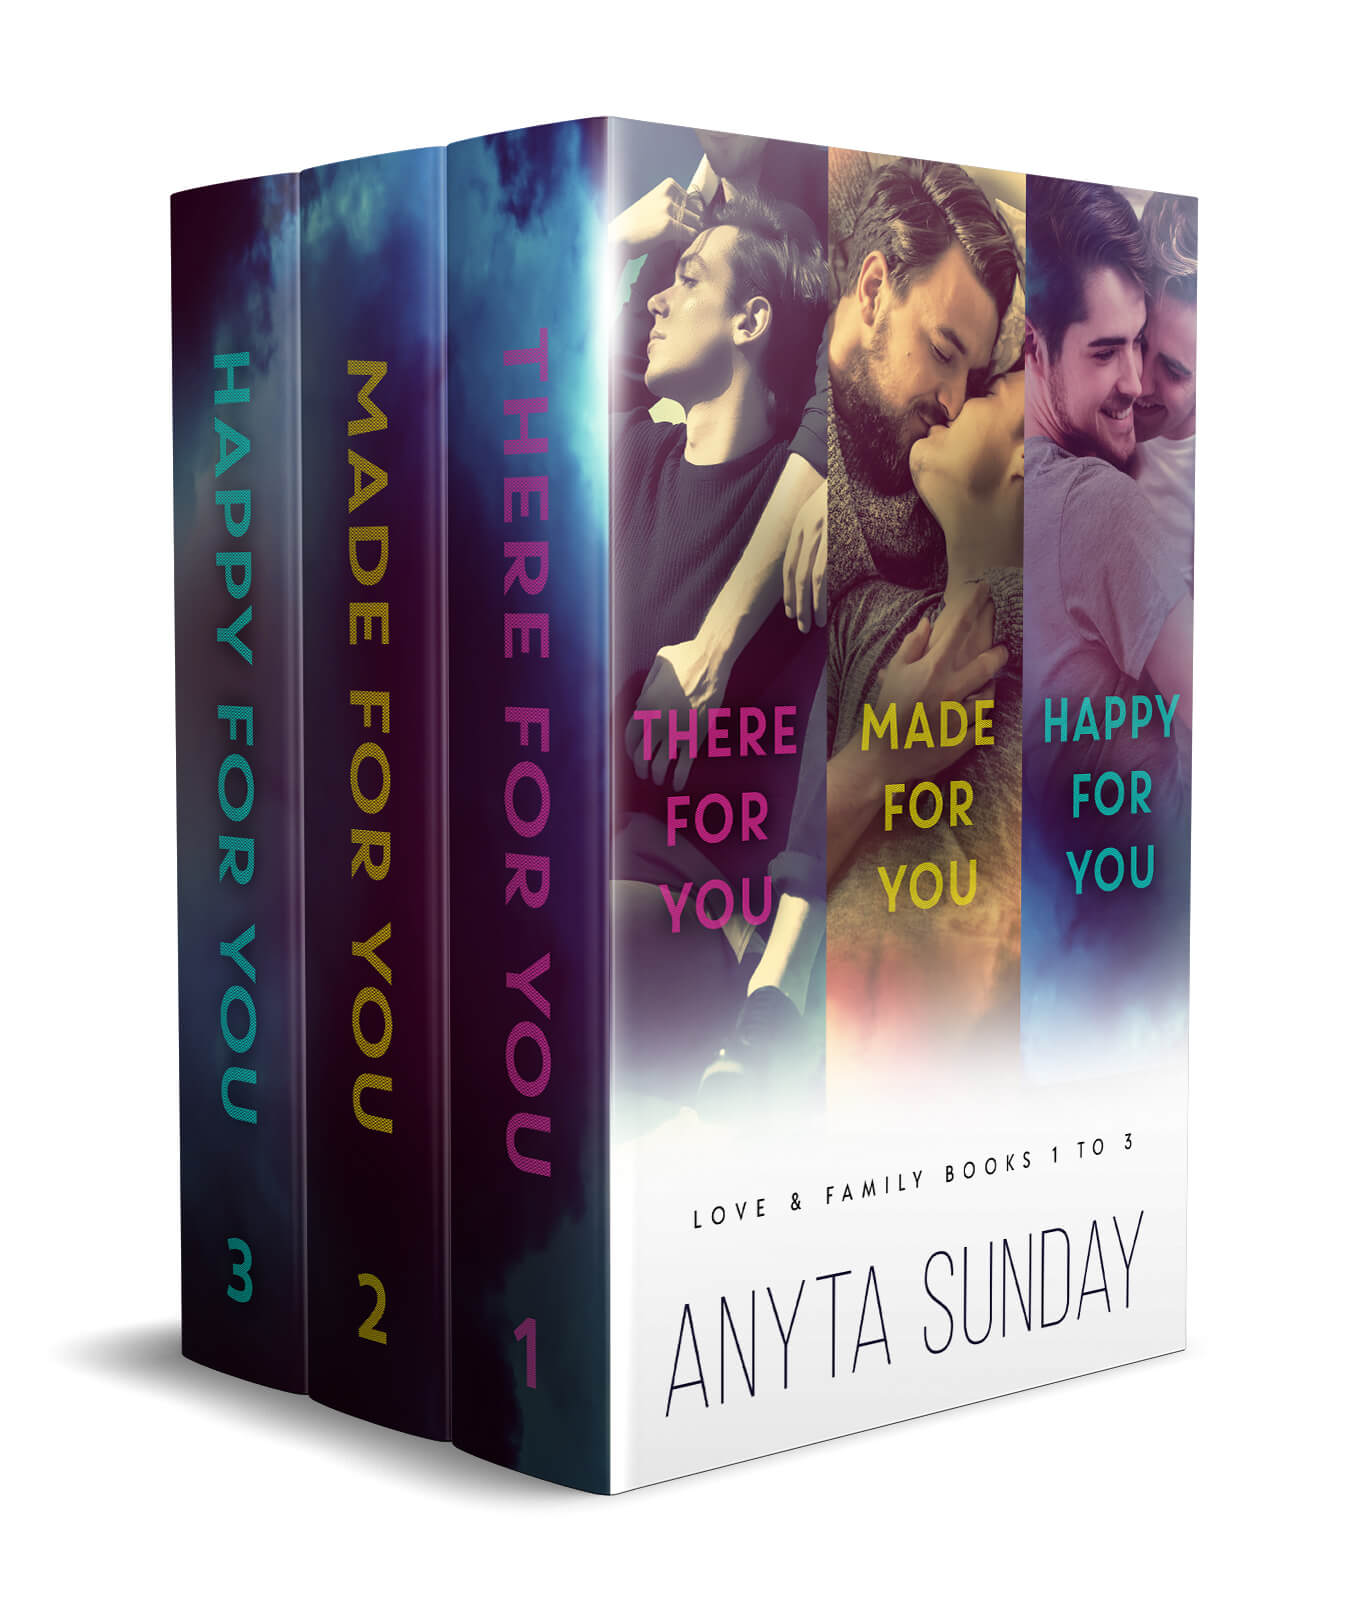 Love & Family box set